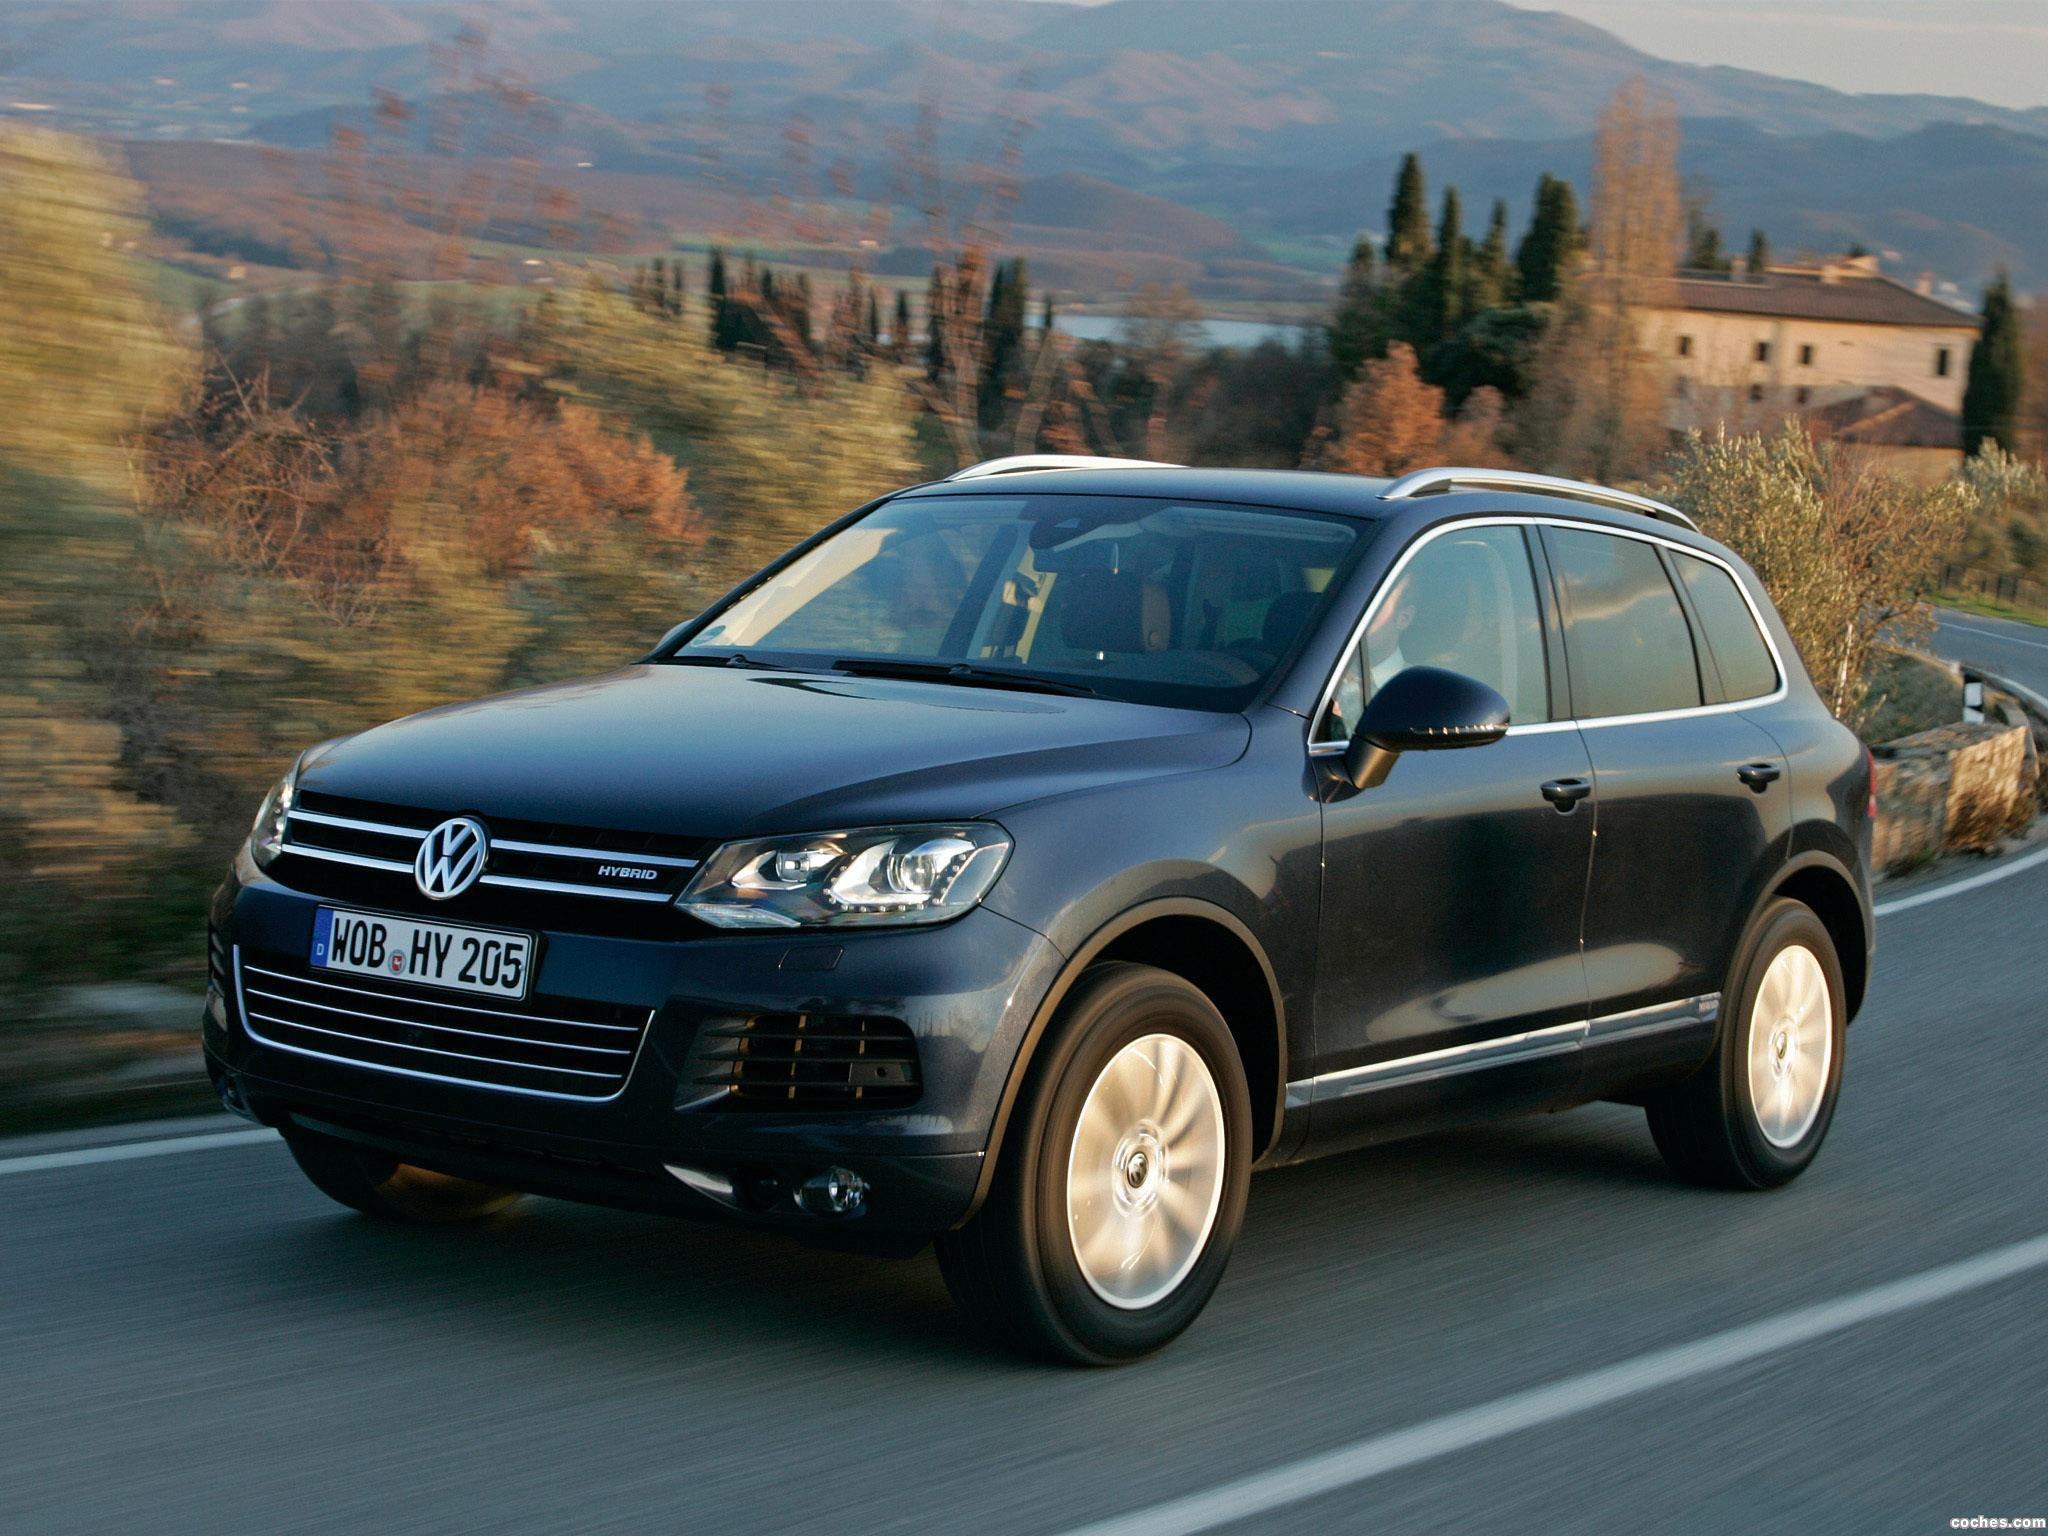 Foto 0 de Volkswagen Touareg Hybrid 2010